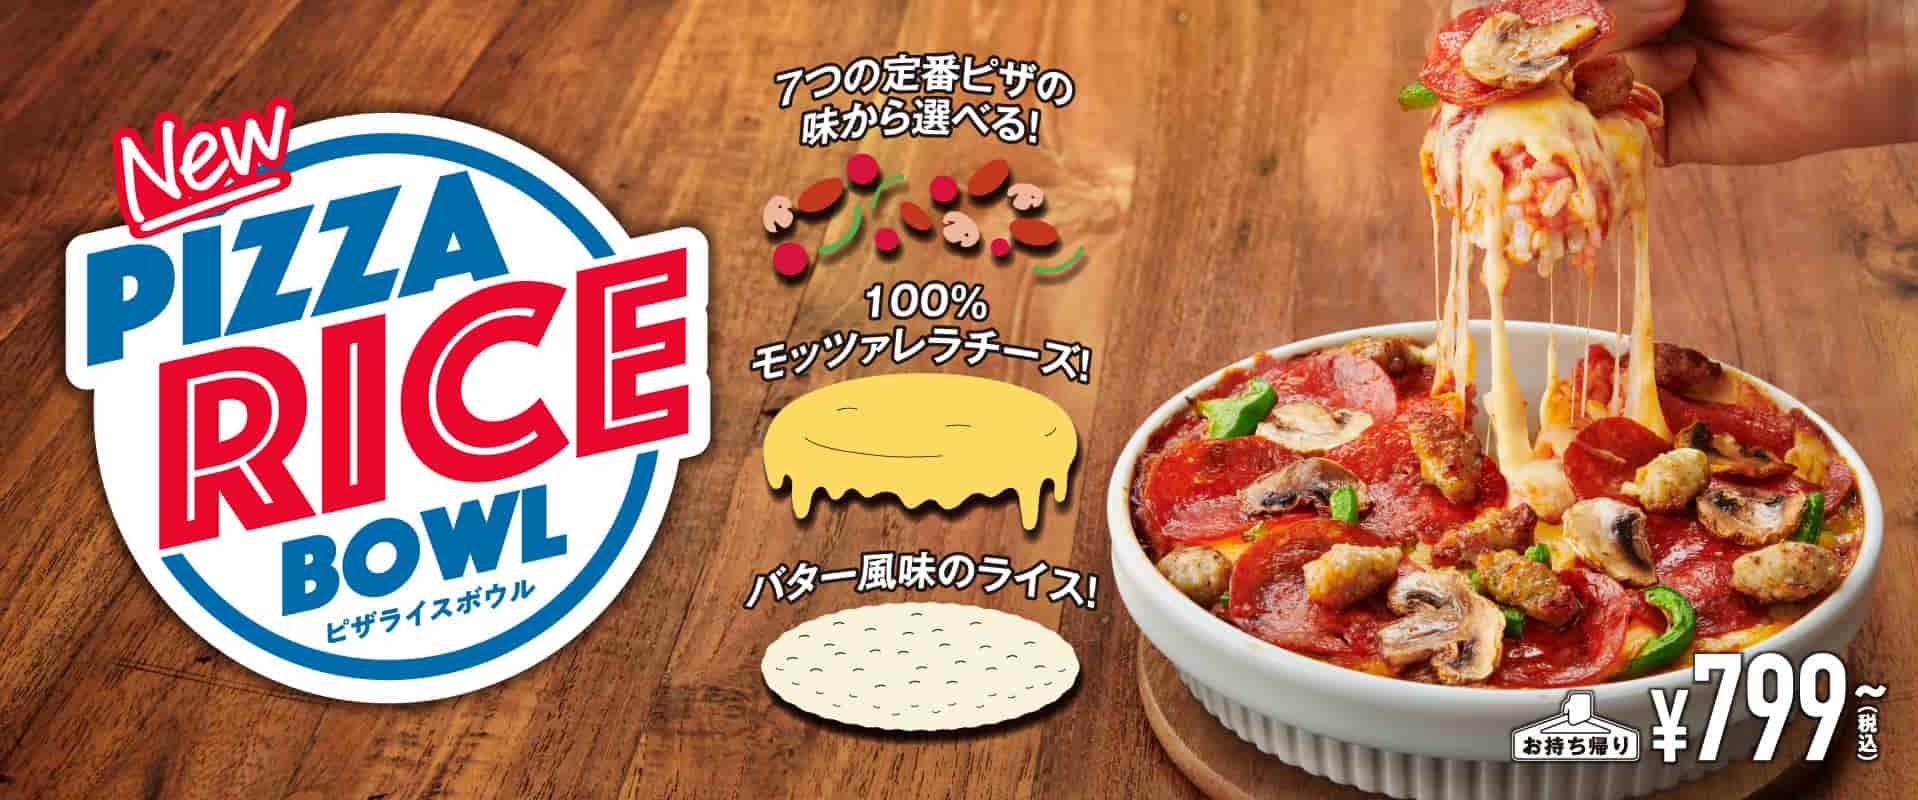 Pizza Rice Bowl Customize